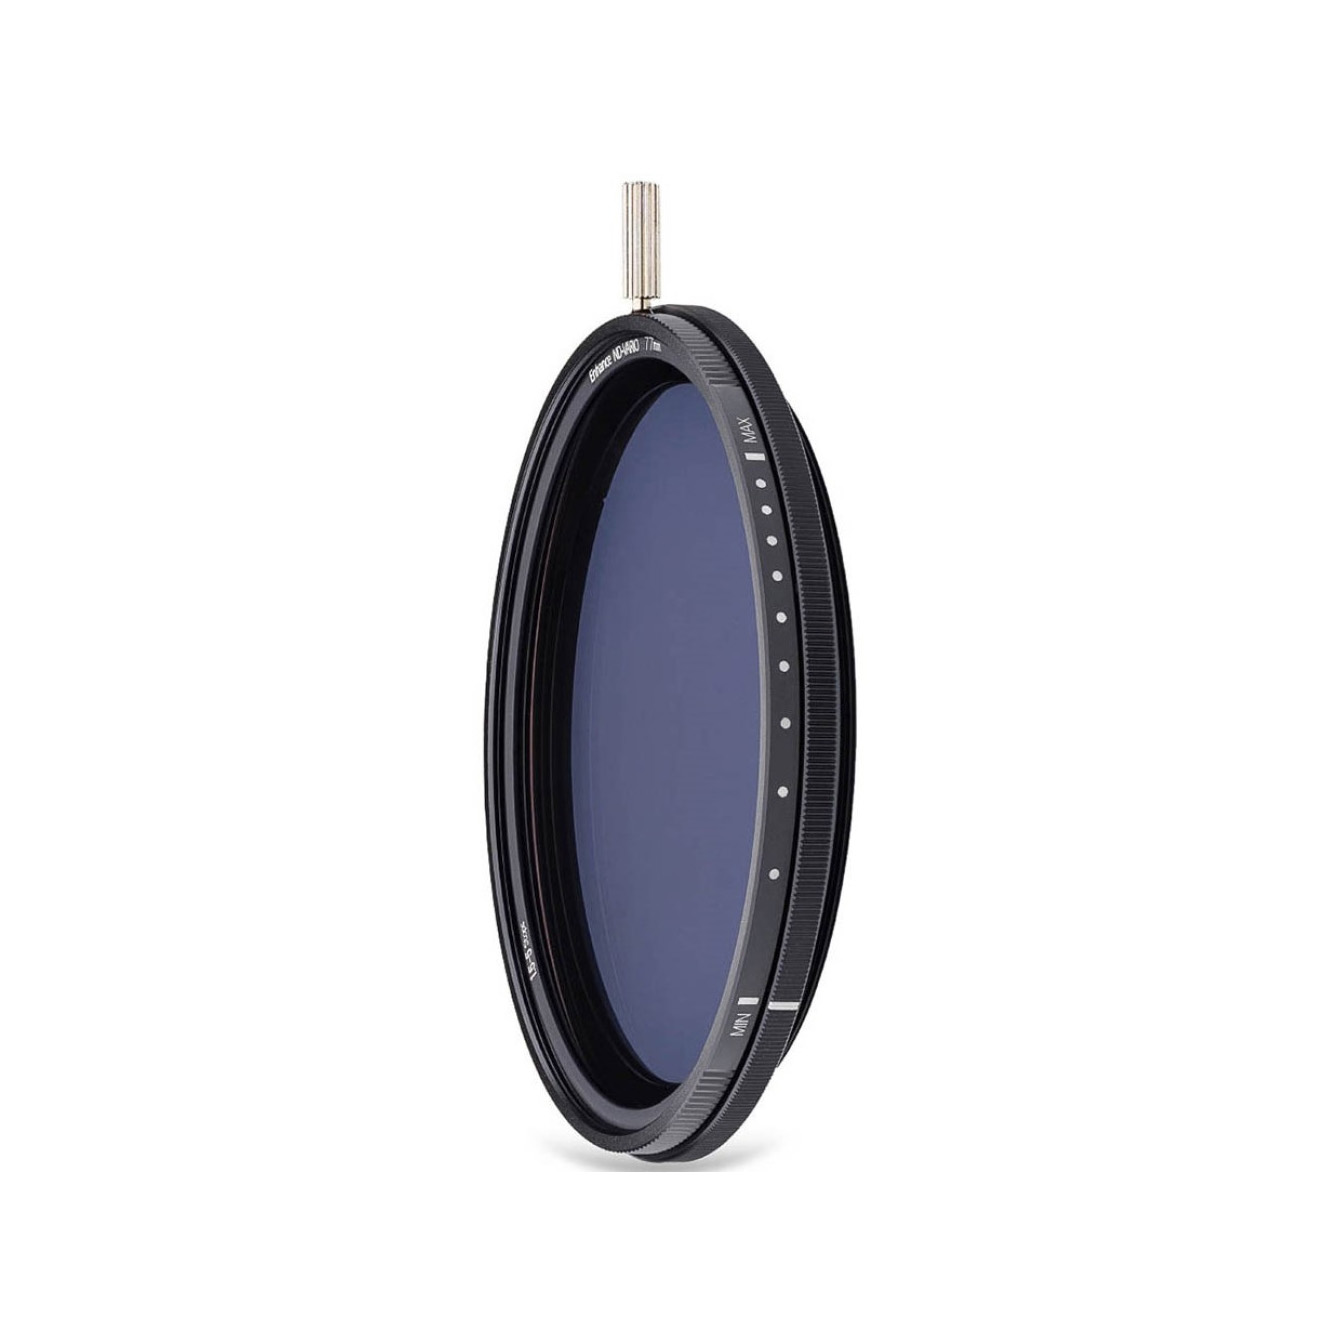 فیلتر ND متغیر NiSi Pro Nano 1.5-5 Stop Enhance ND-VARIO 82mm